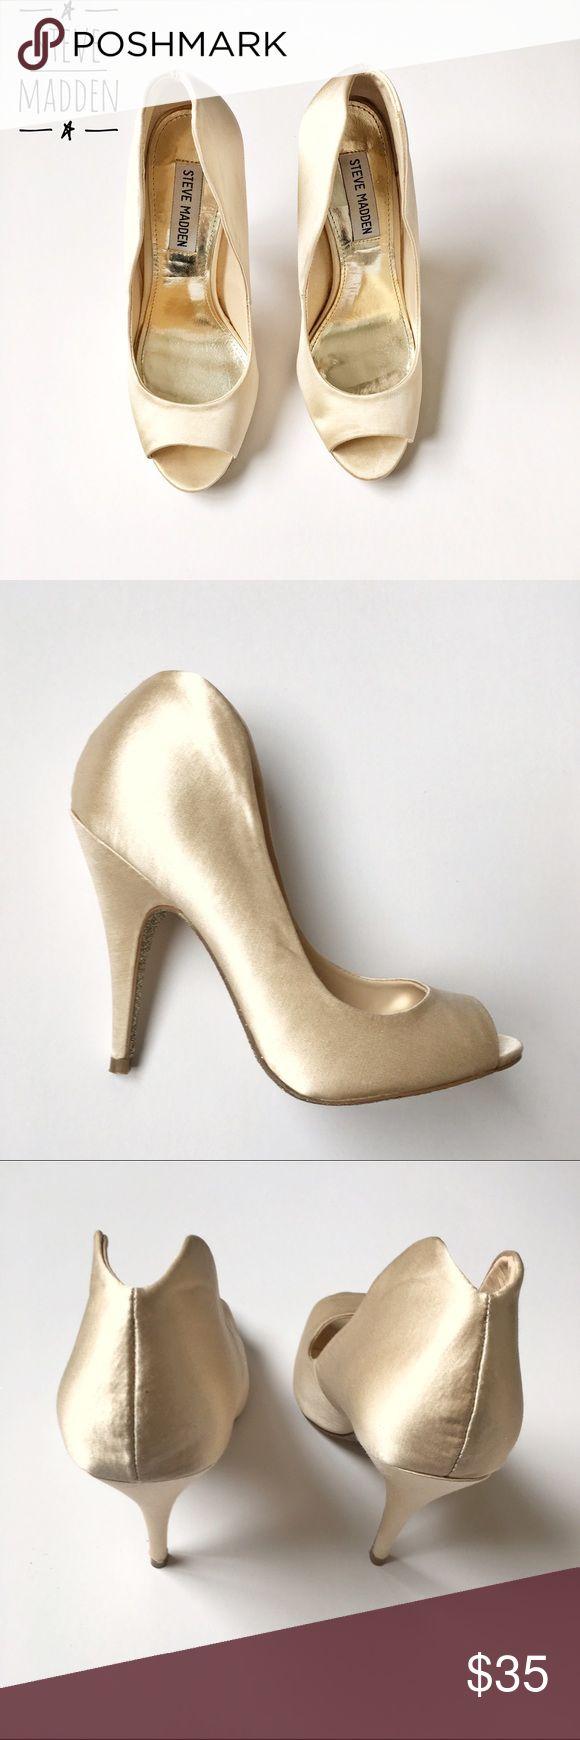 Steve Madden satin pumps Peep toe pumps . Worn only once . Cream color . Steve Madden Shoes Heels